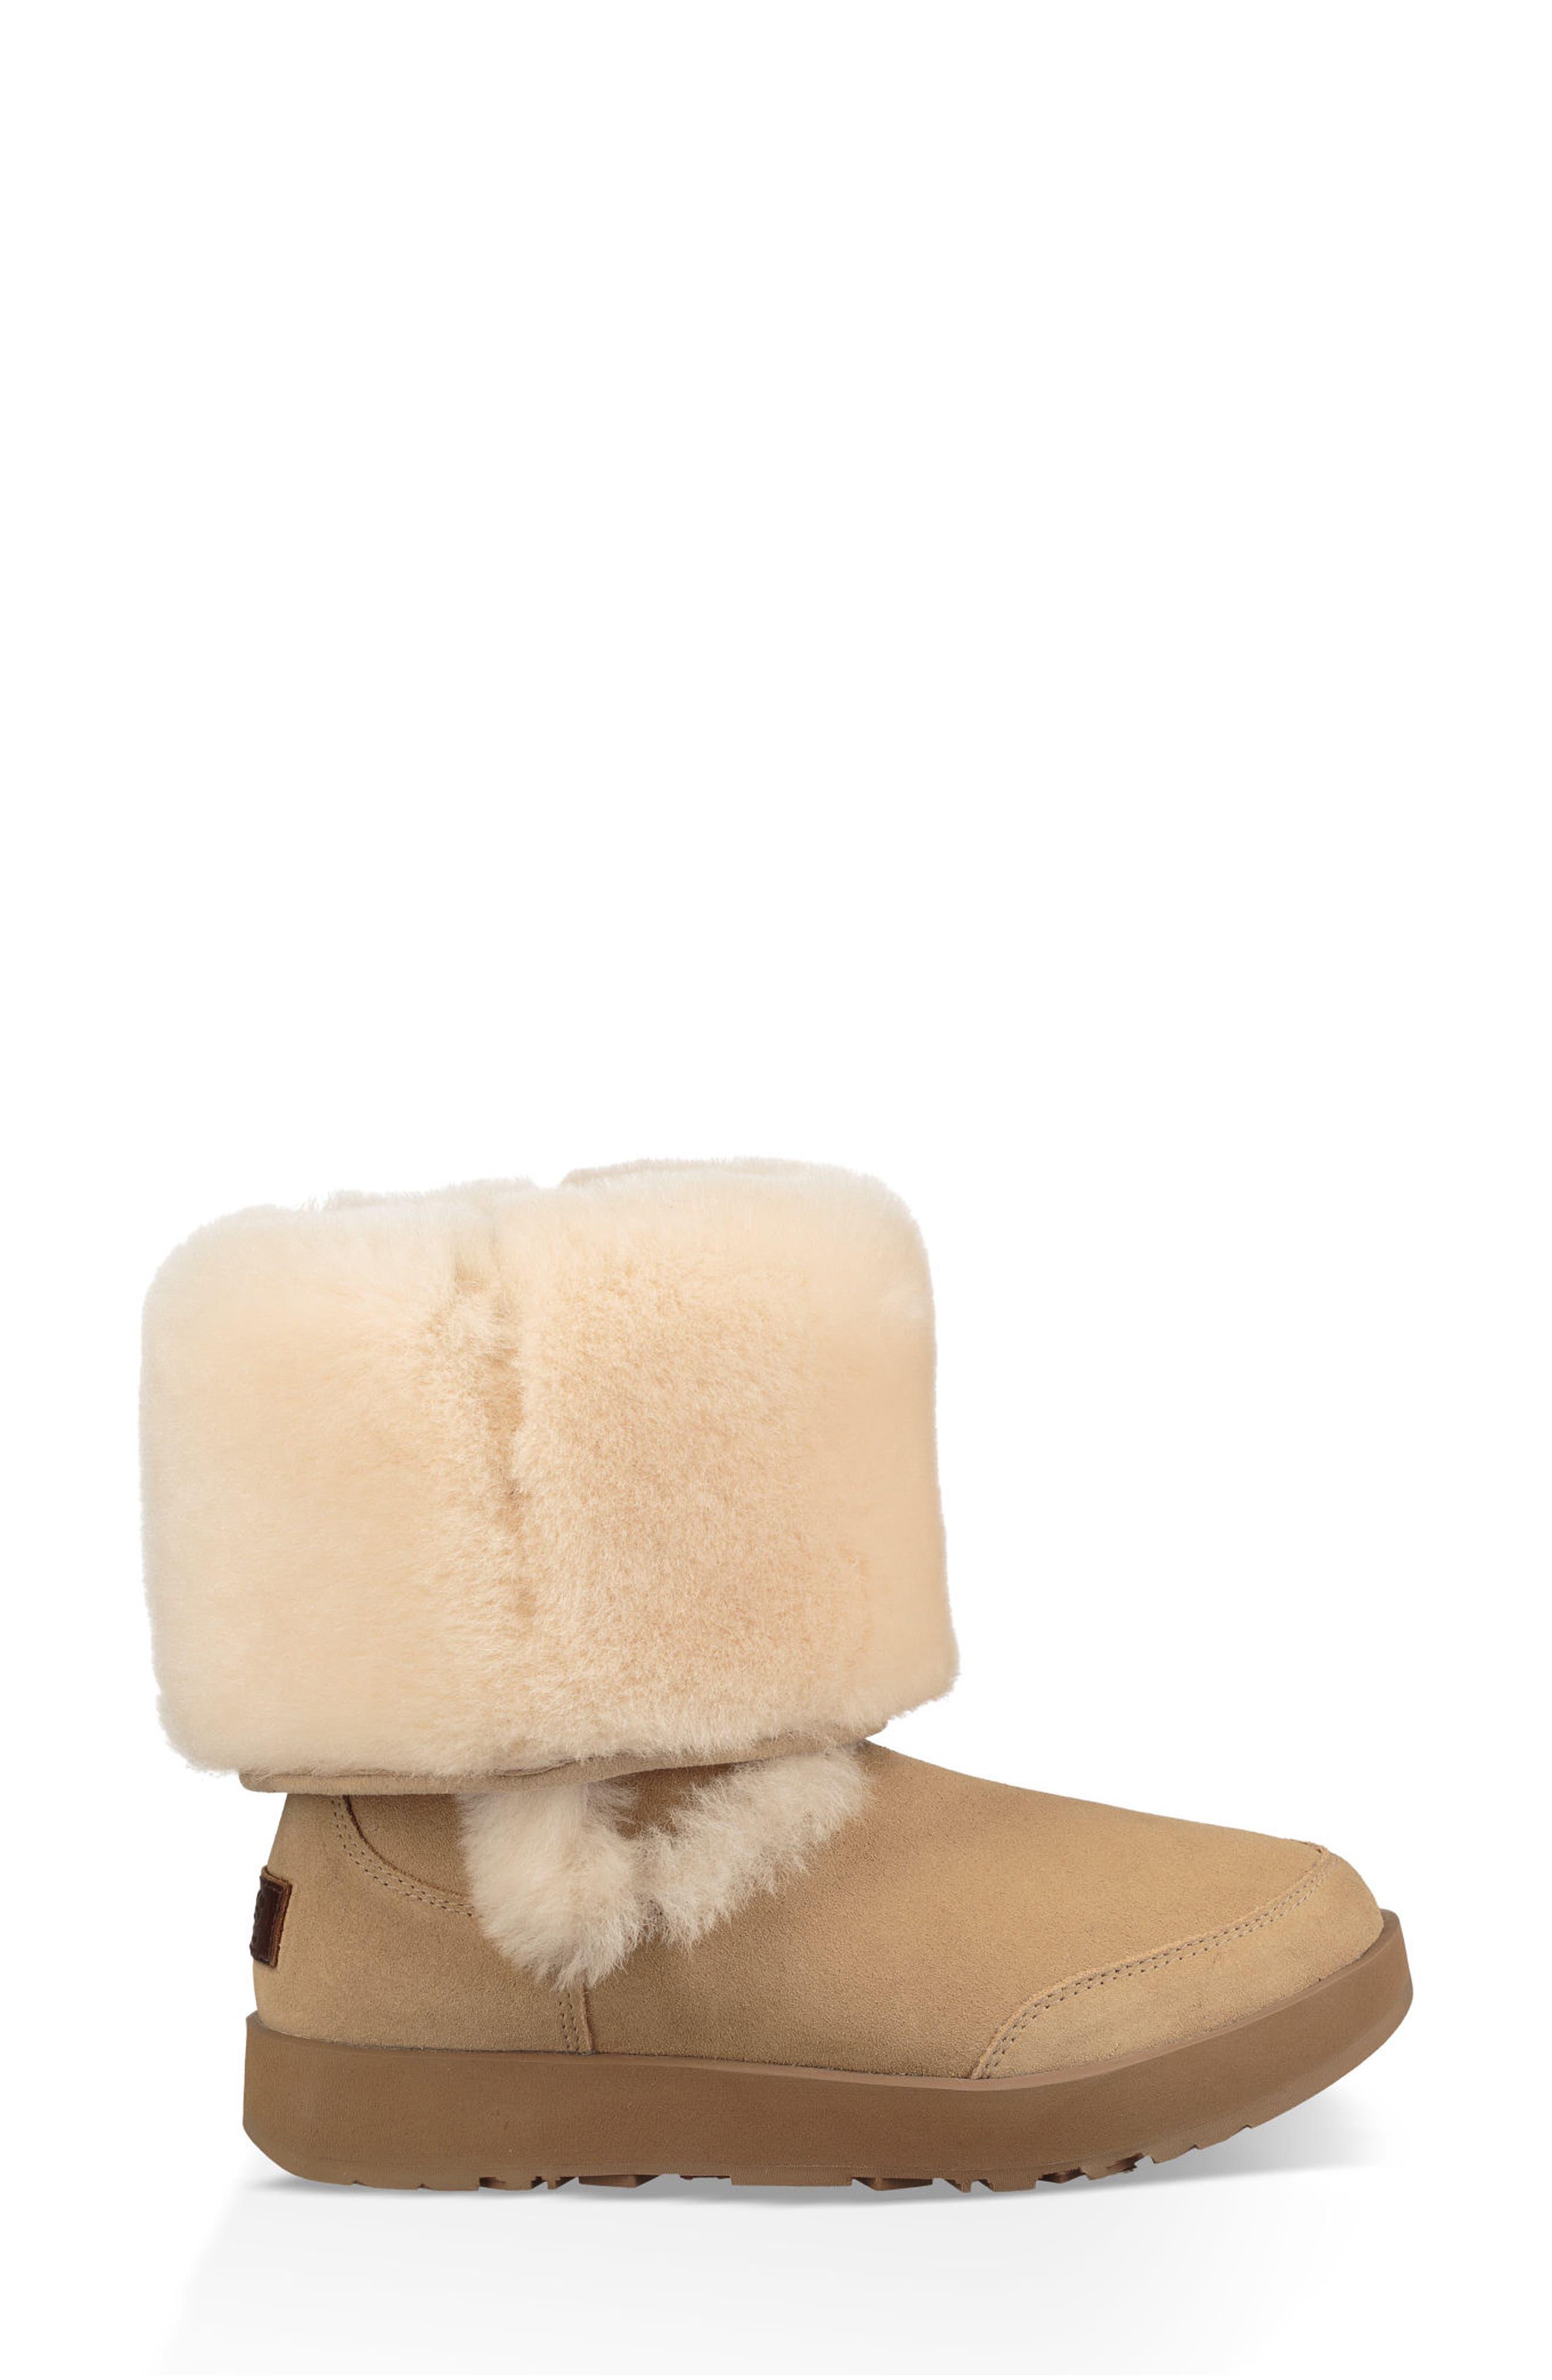 Sundance Genuine Shearling Waterproof Boot,                             Alternate thumbnail 6, color,                             Sand Suede